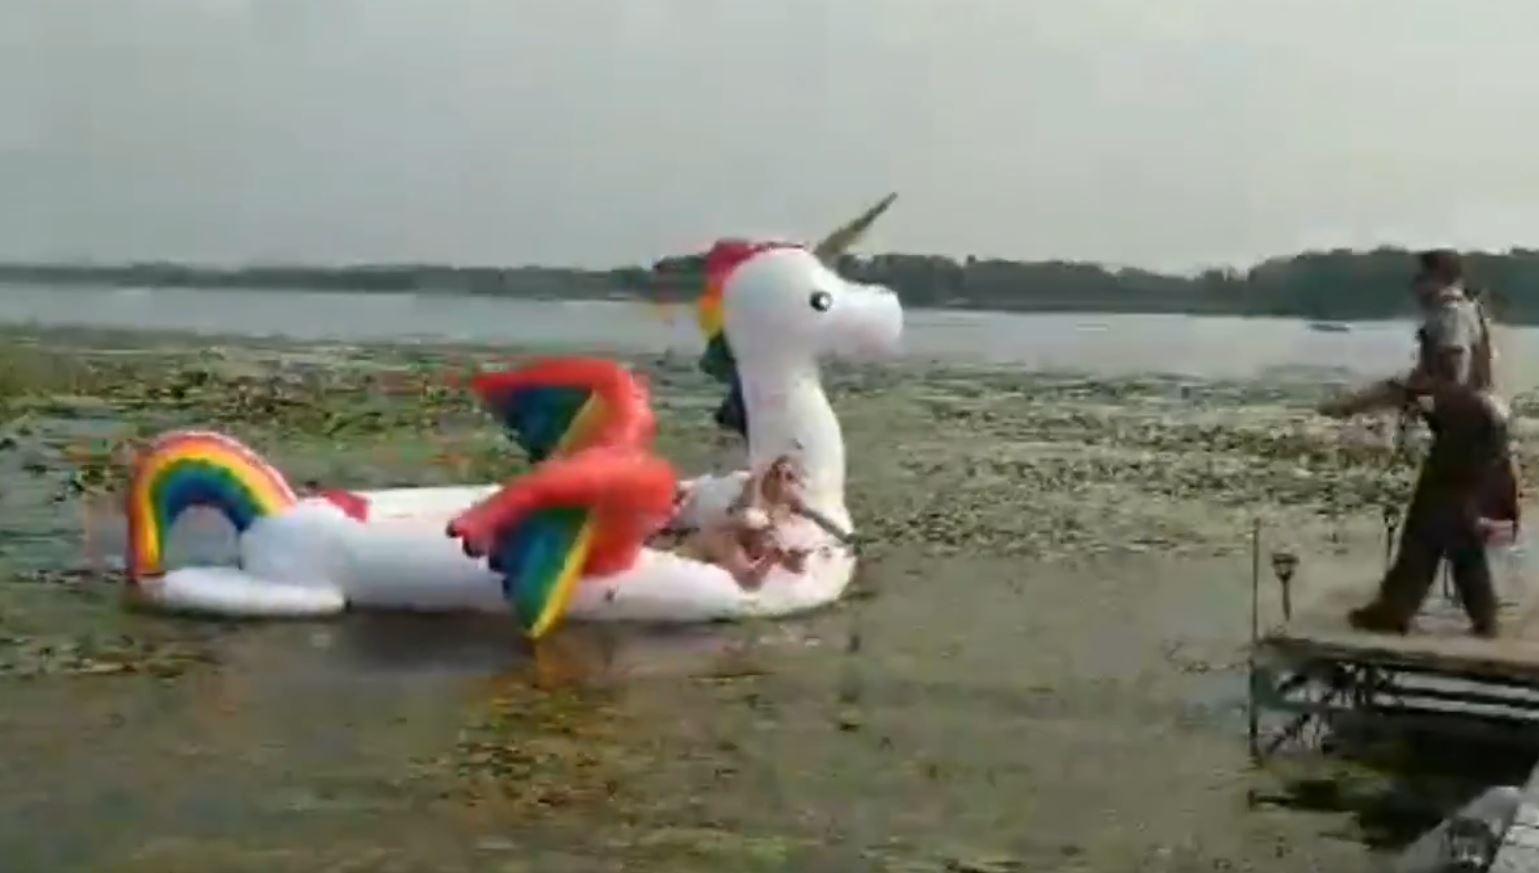 minnesota unicorn rescue_1534112125935.jpg-846652698-846652698.jpg